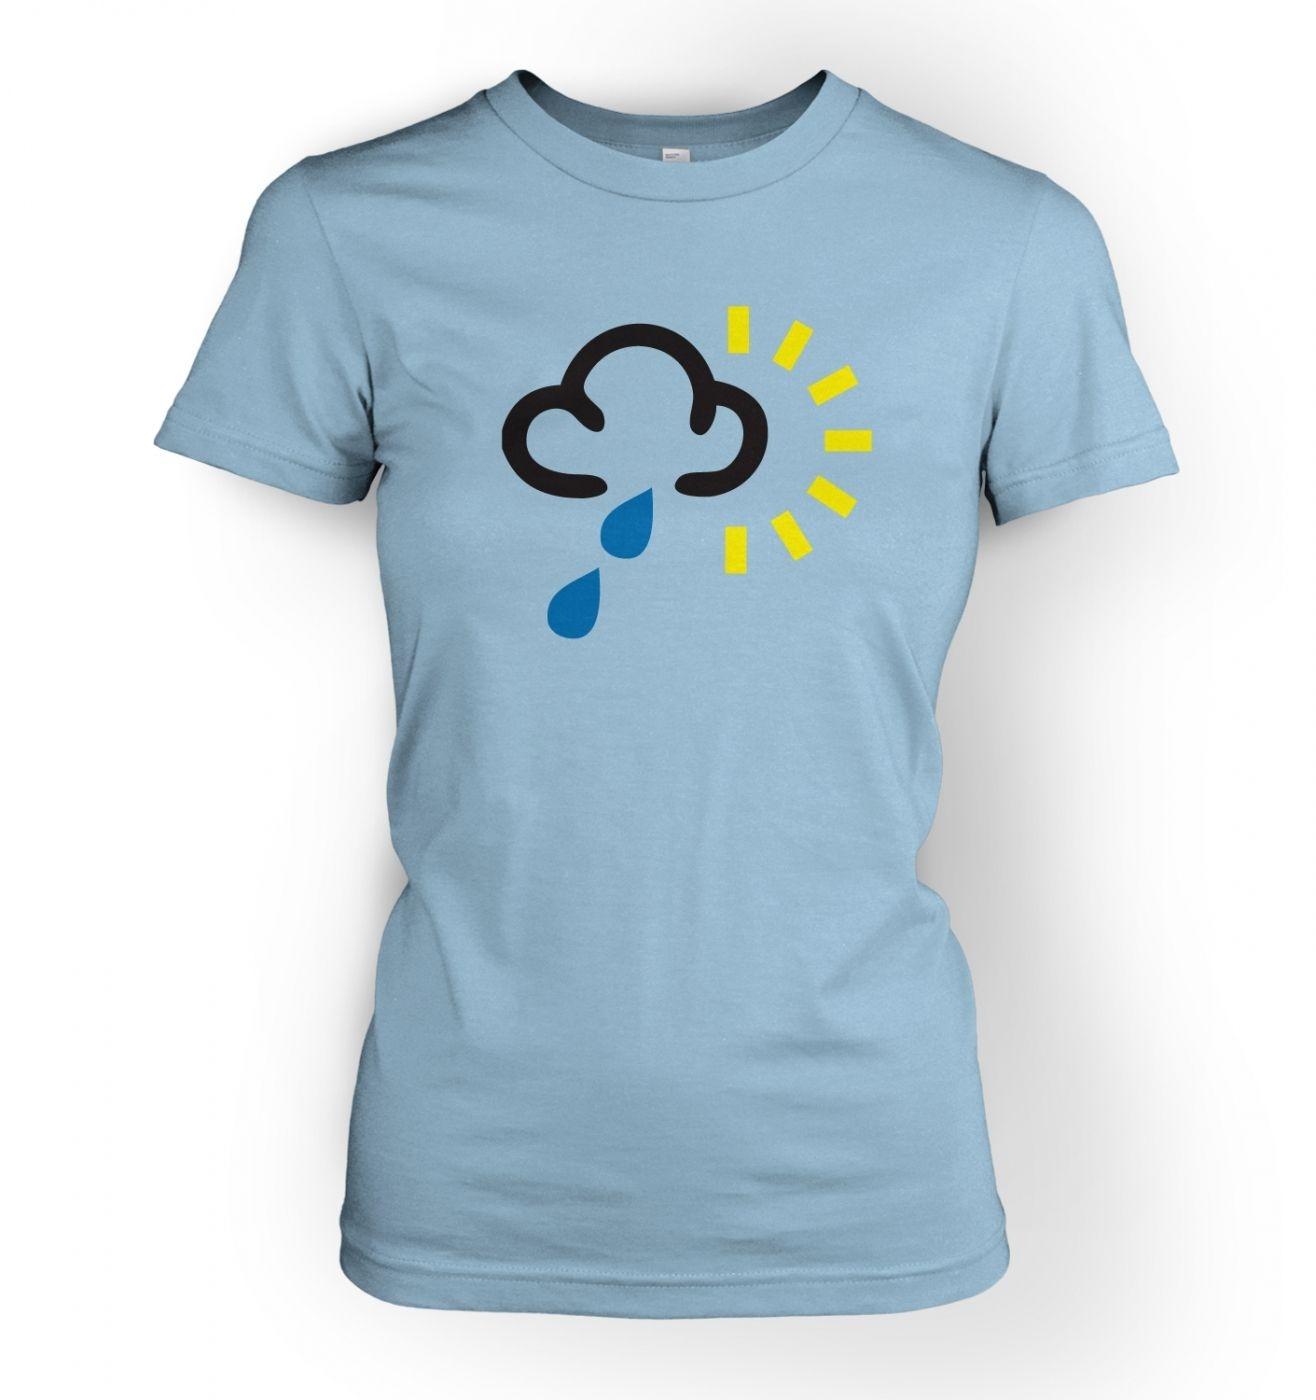 Women's Weather Symbol Heavy Rain with Sun t-shirt